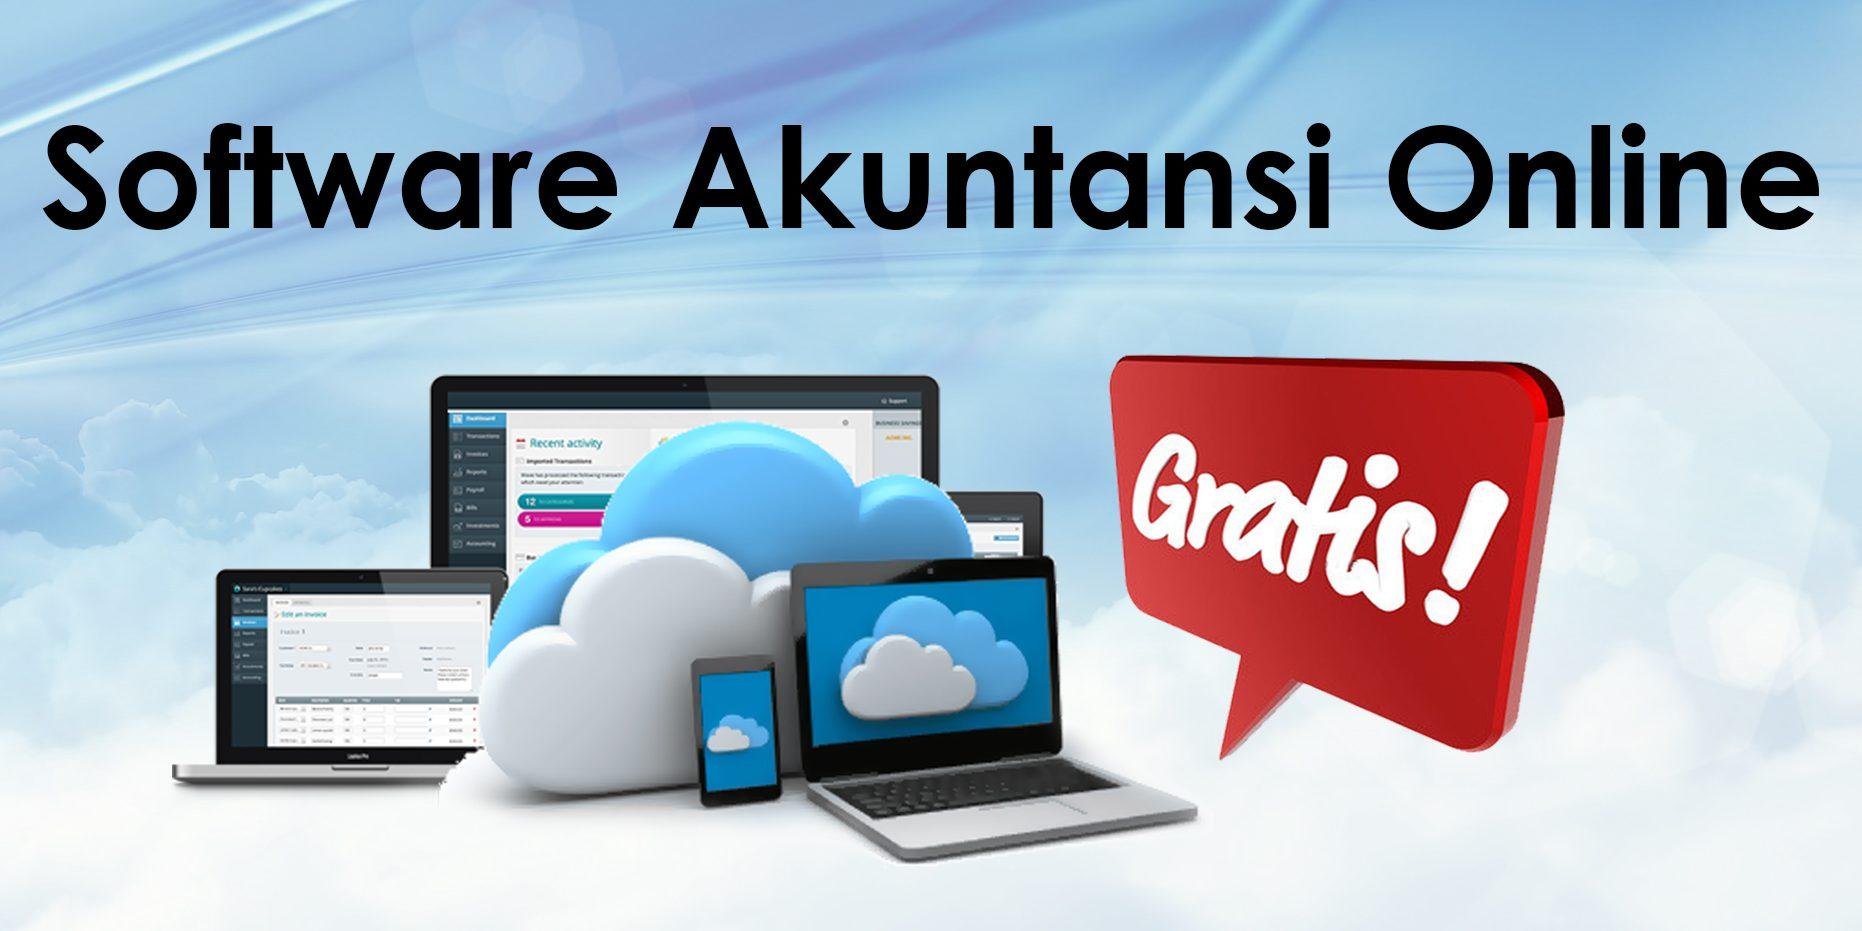 Software Akuntansi Online Gratis Acis Indonesia